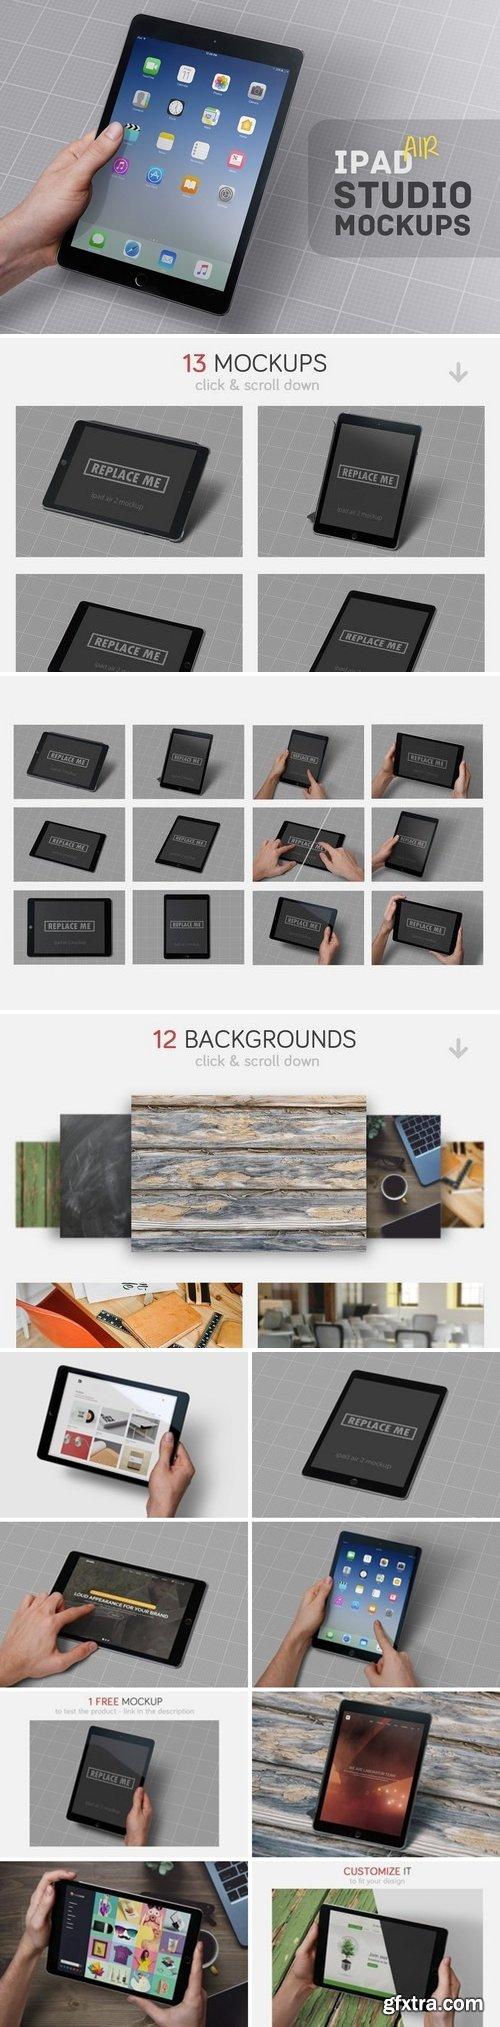 CM - iPad Air Studio Mockups 1306667